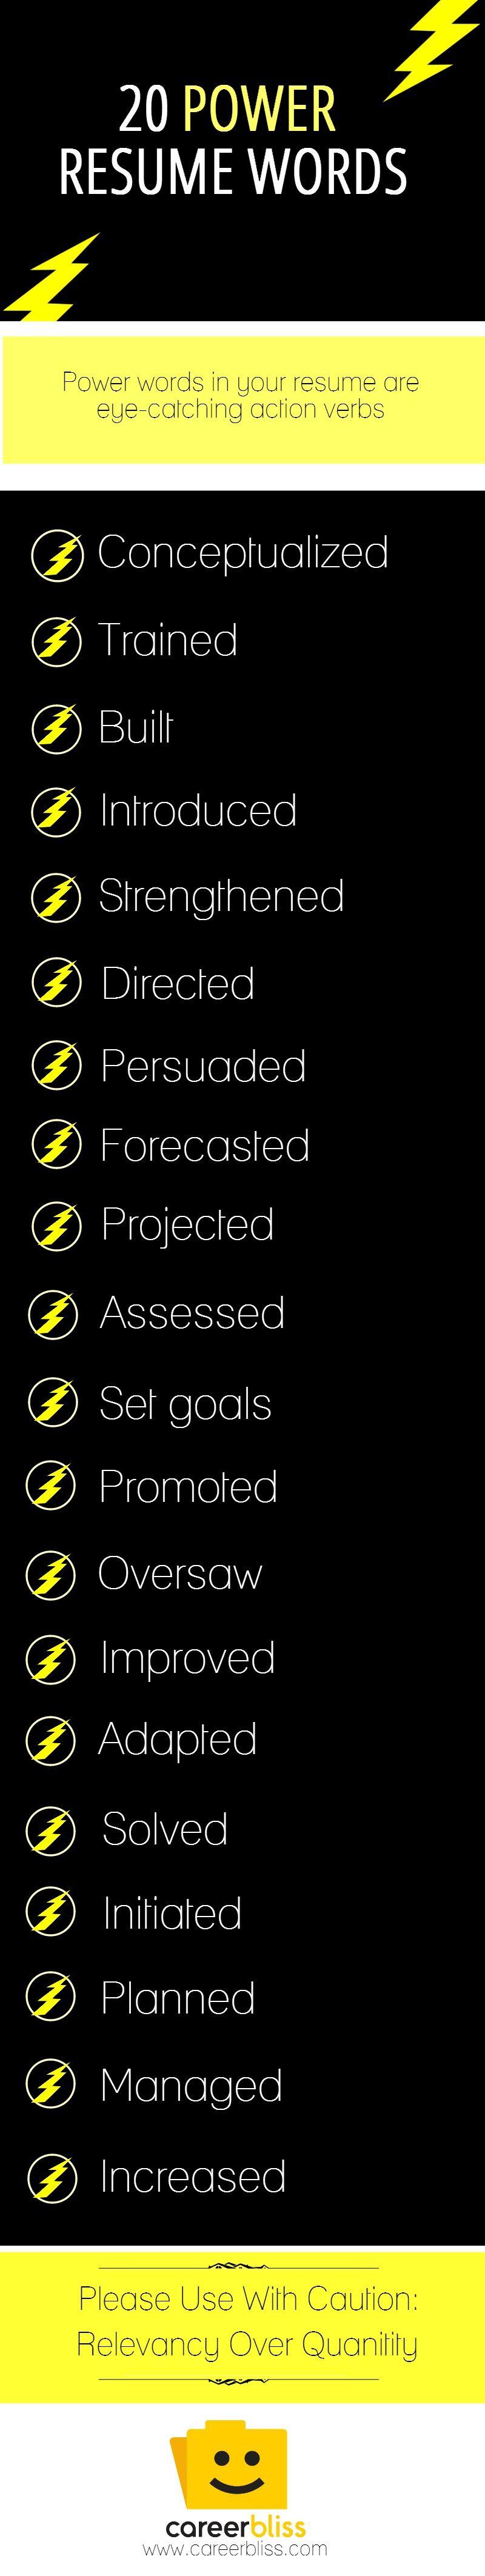 20 Resume Power Words infographic Resume power words